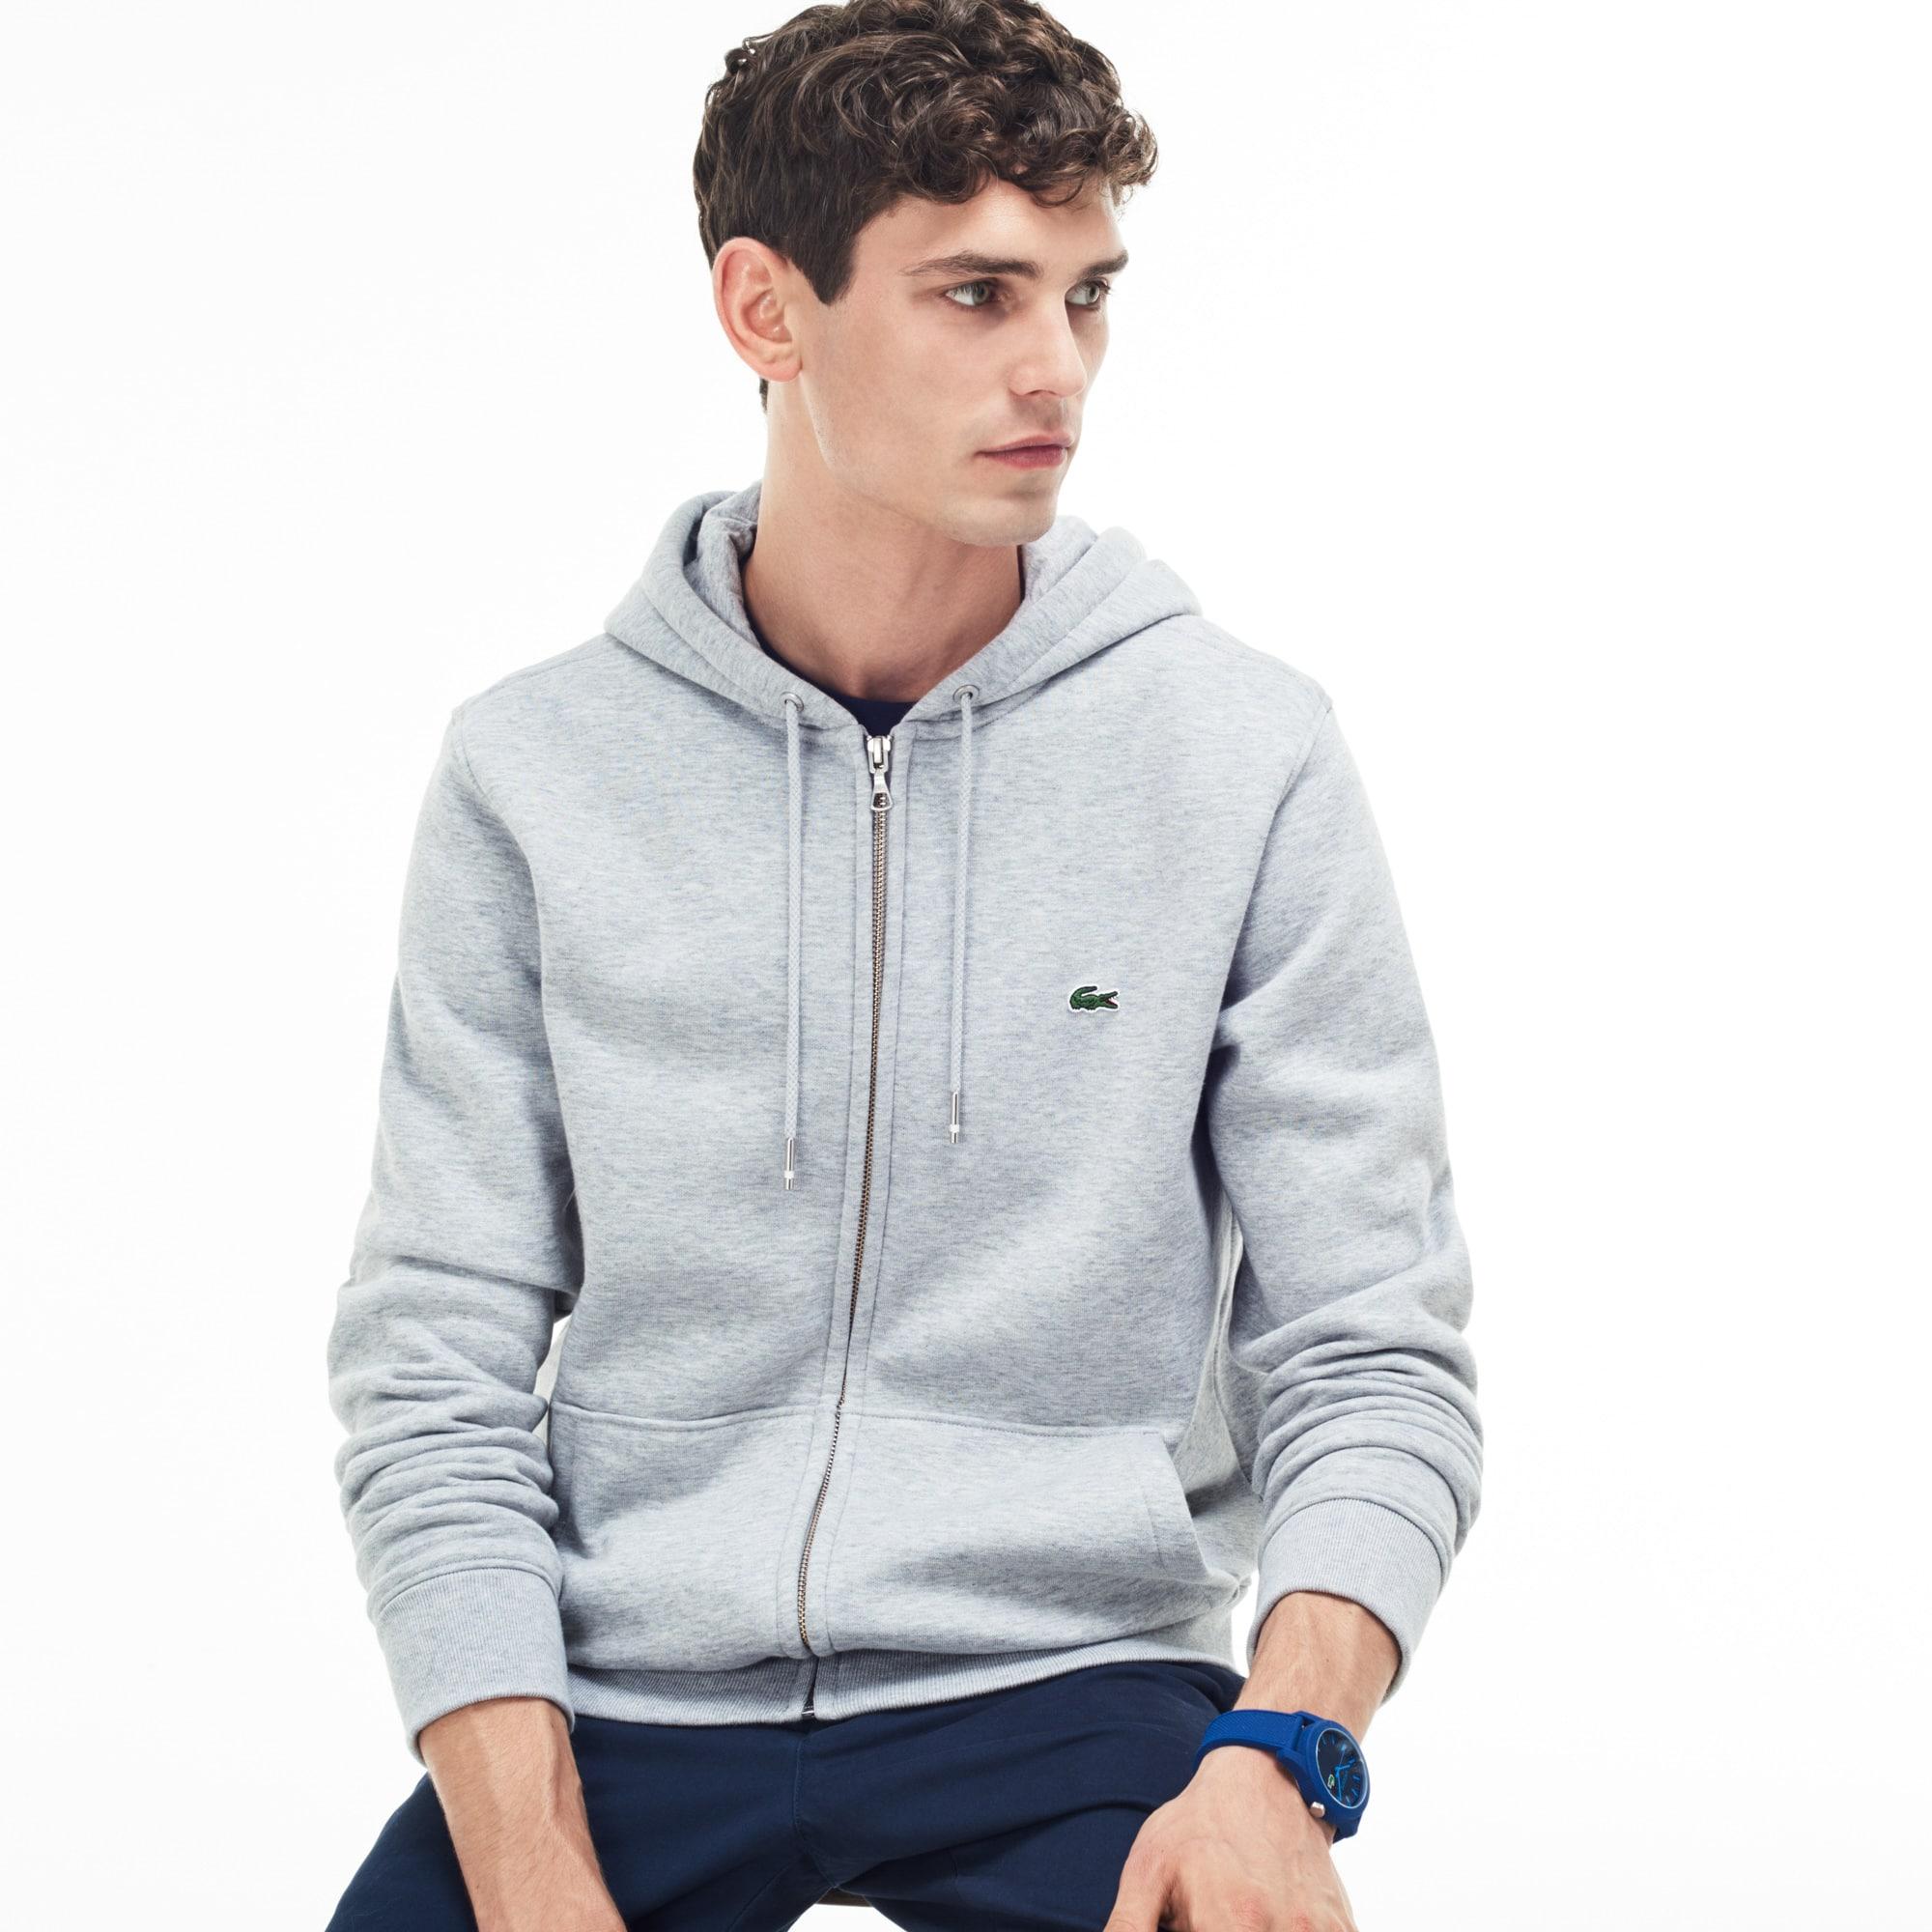 Men's Hooded Zippered Brushed Fleece Sweatshirt